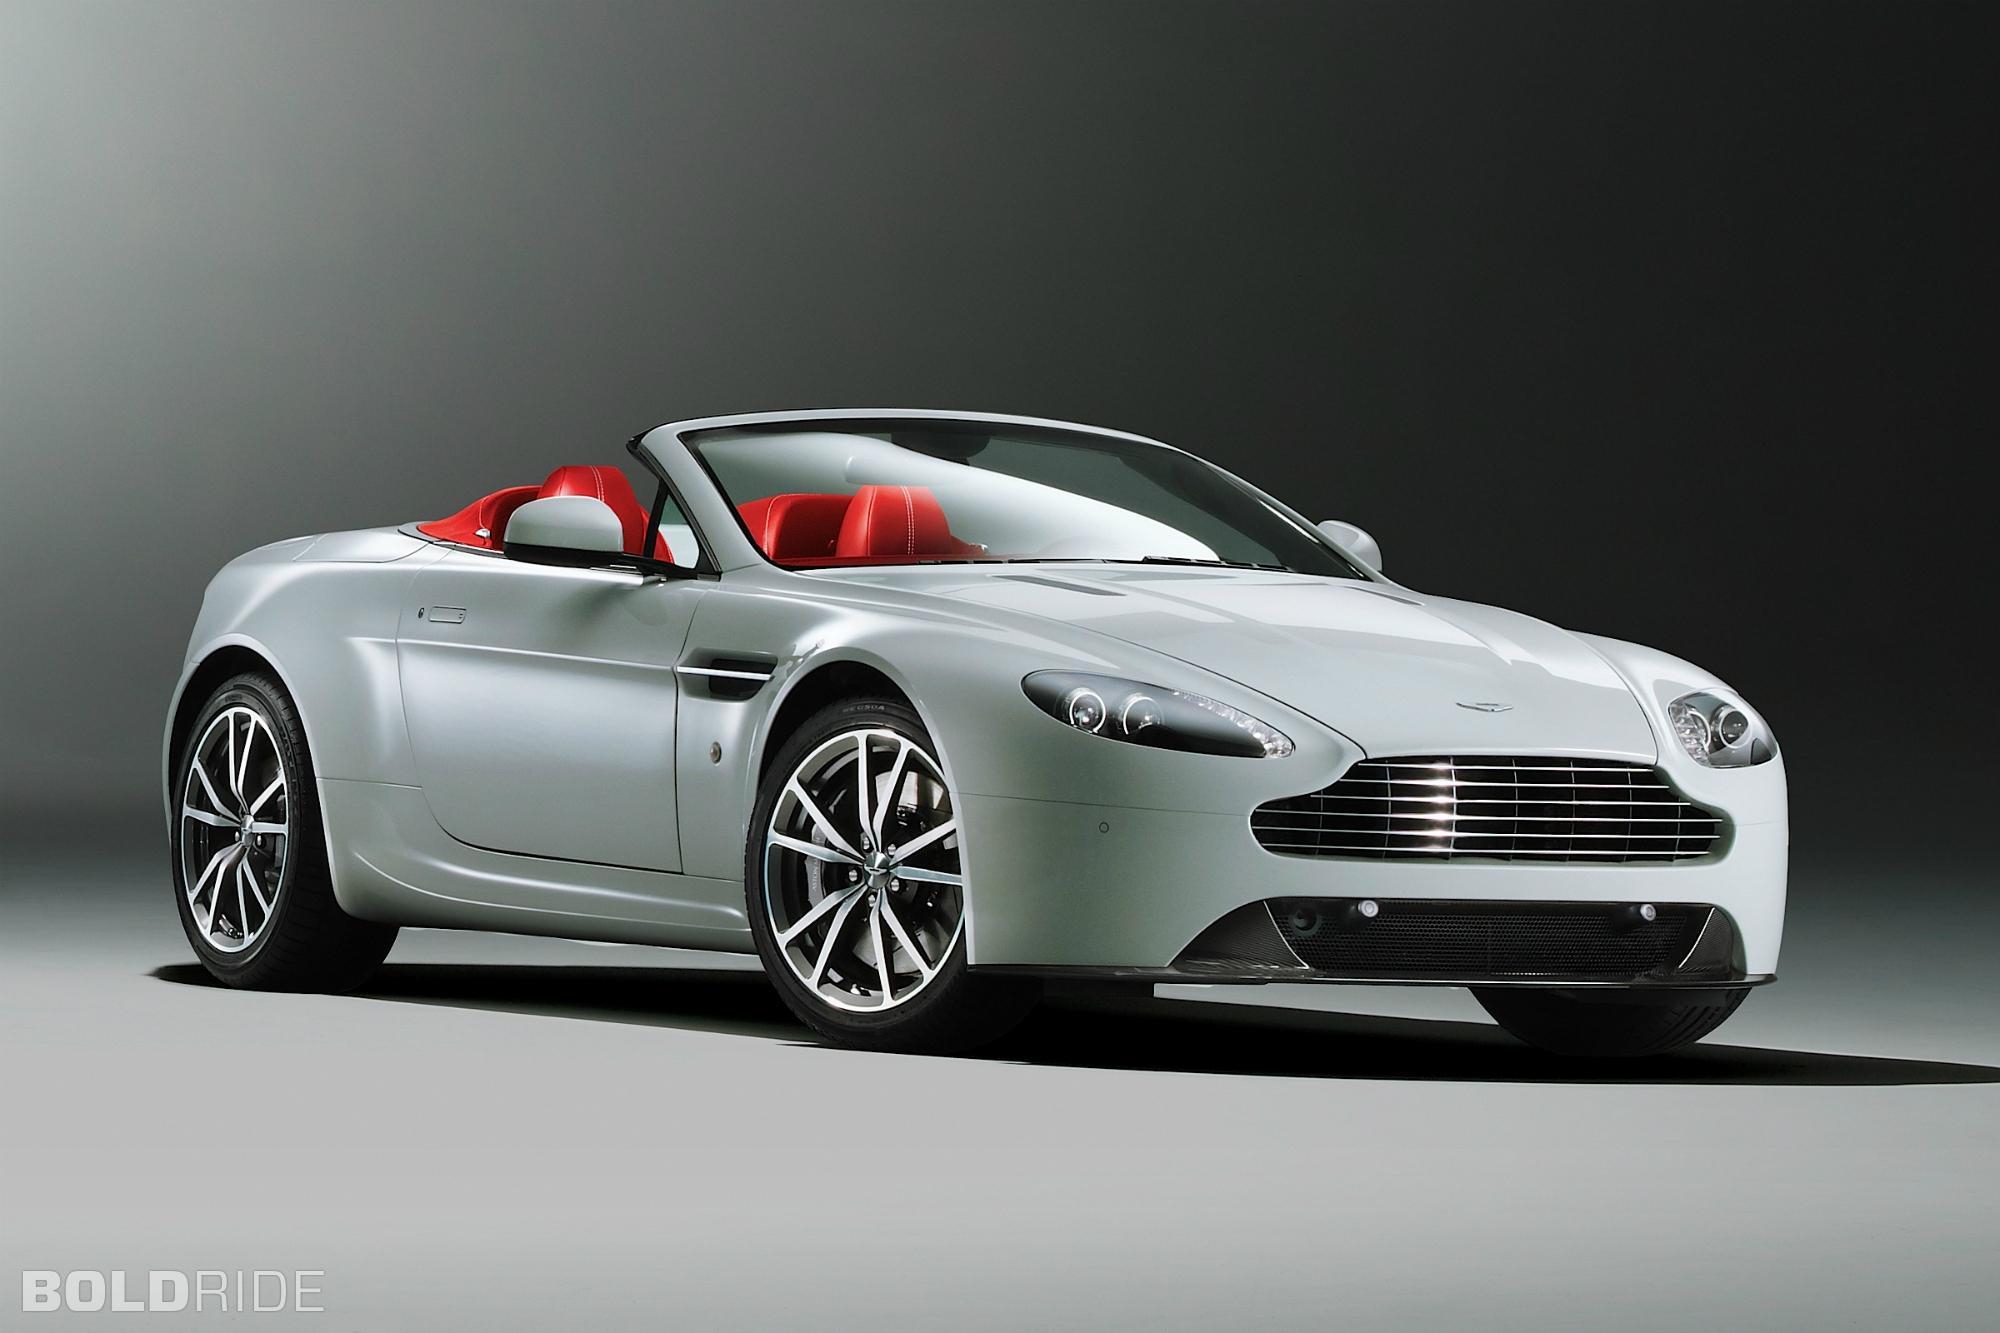 2000x1333 > Aston Martin V8 Vantage S Roadster Wallpapers